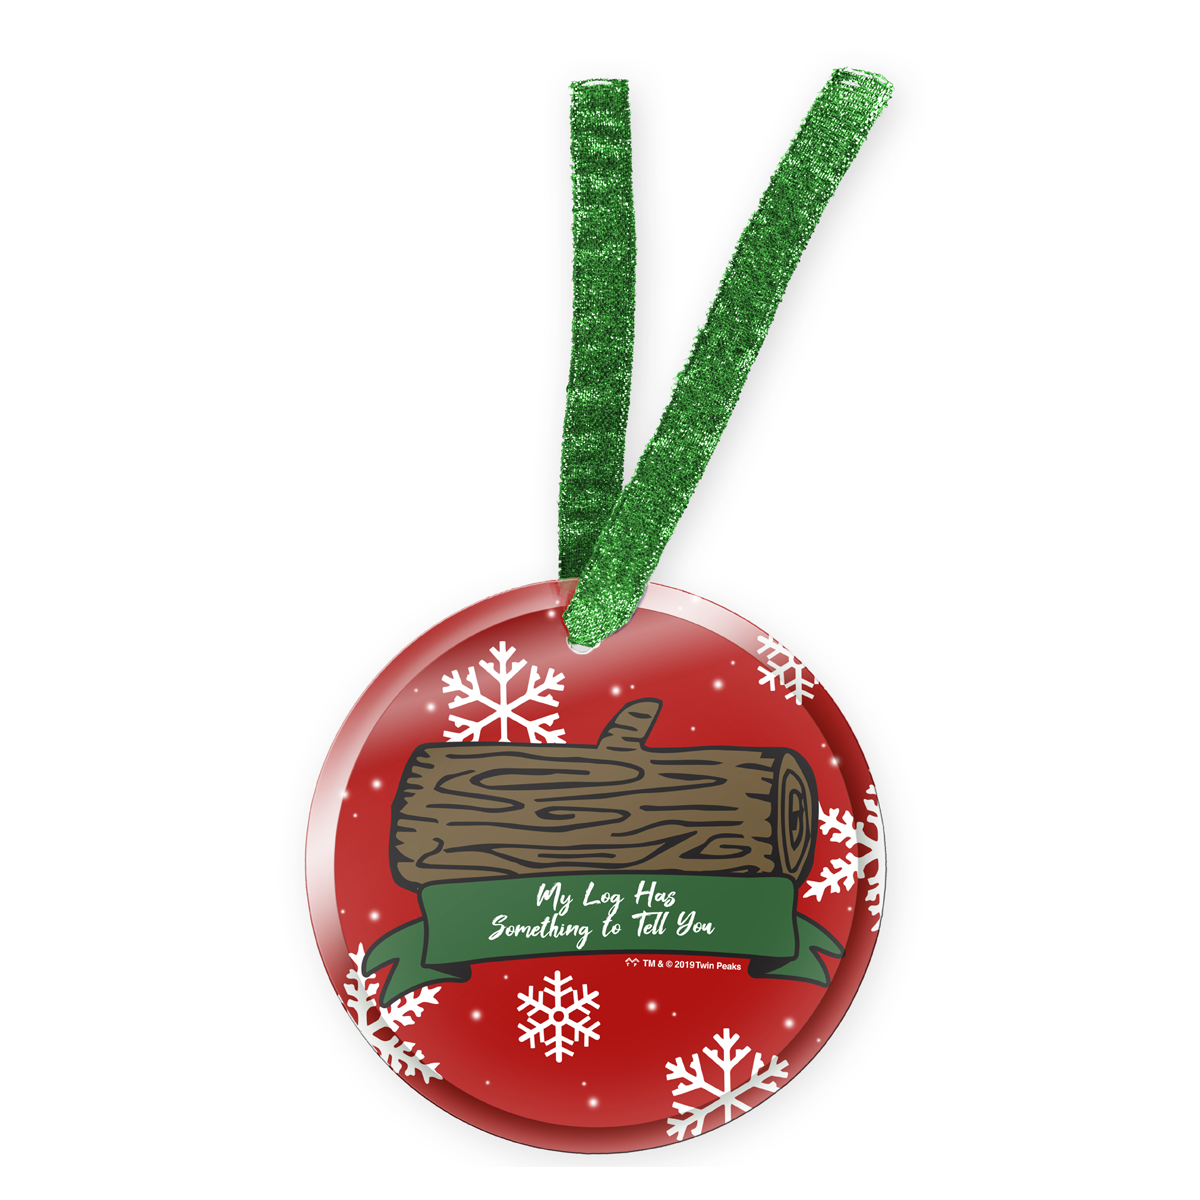 Twin Peaks Log Ornament